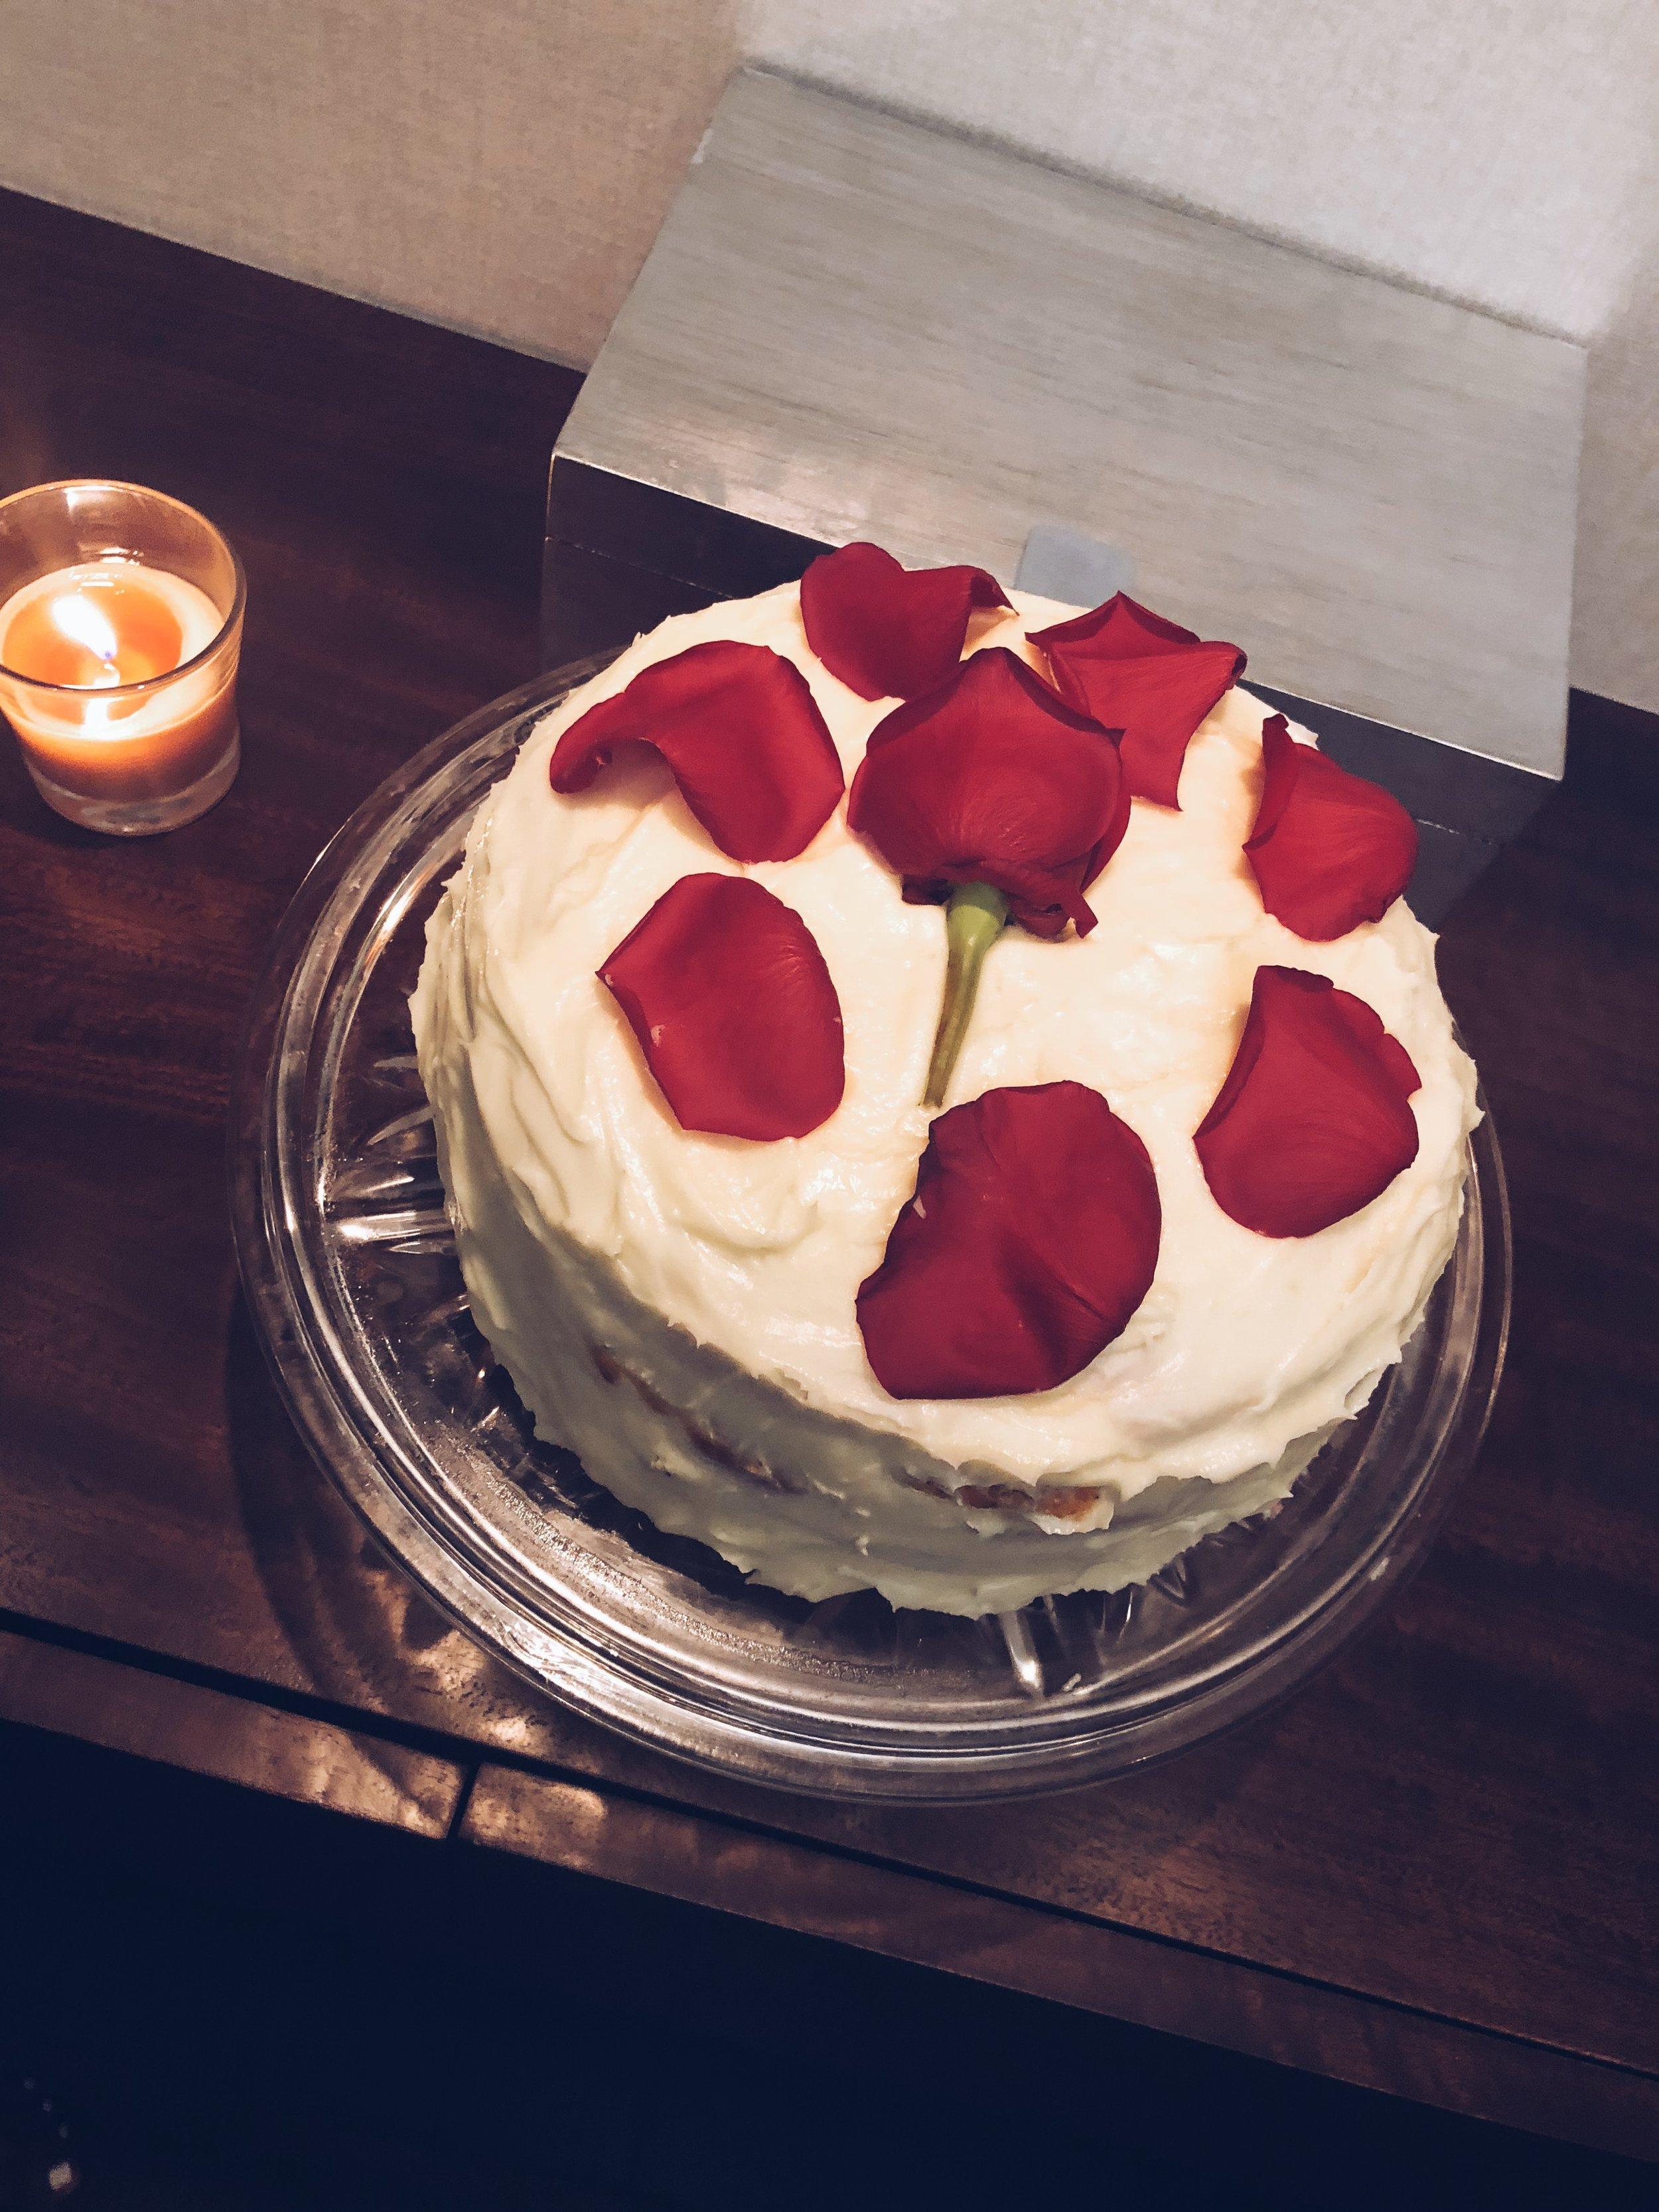 Allison made a cake!